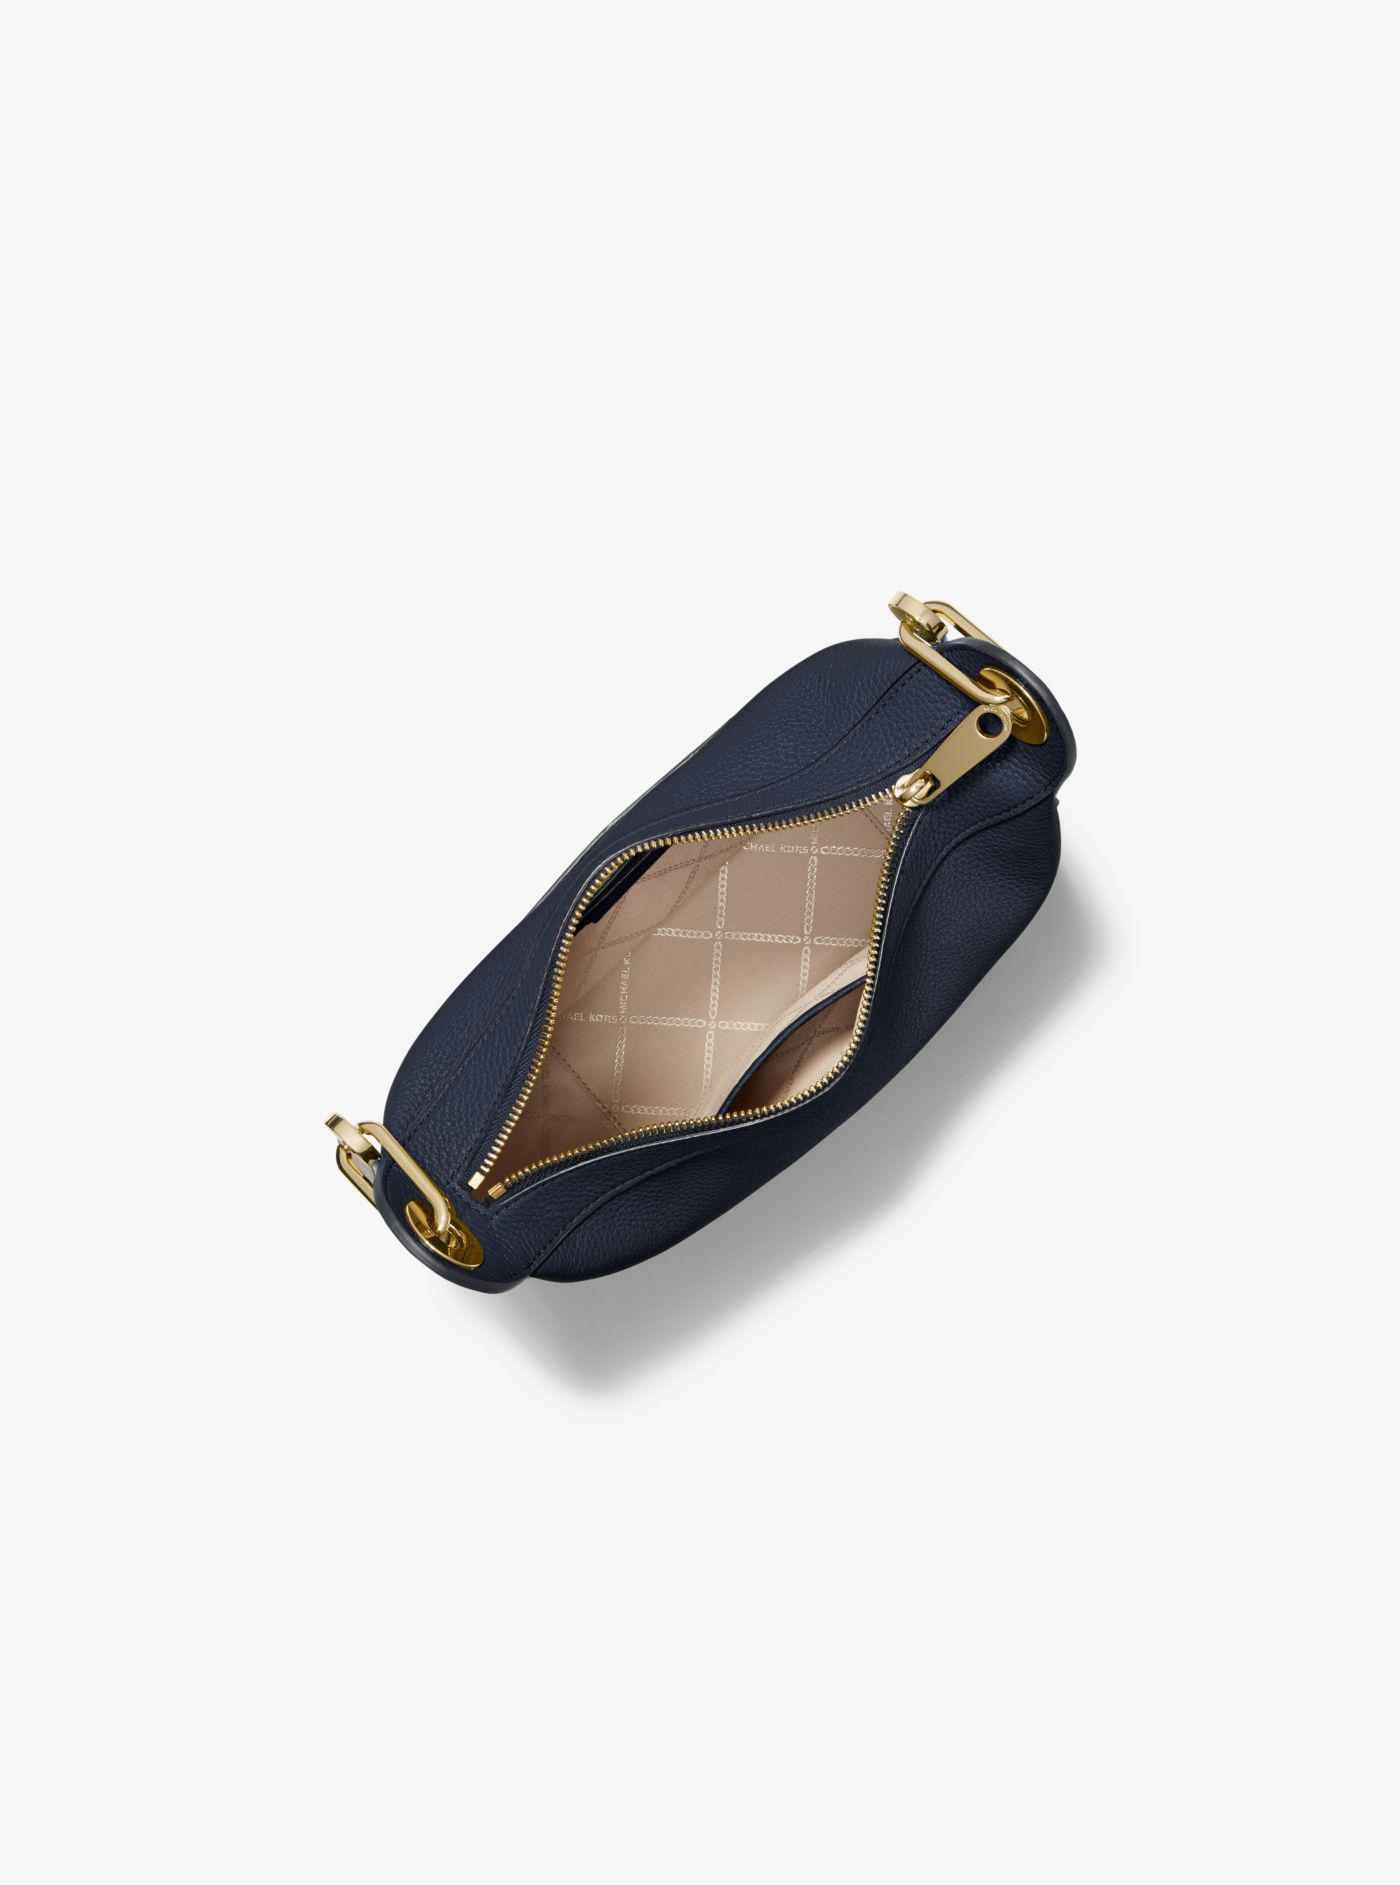 30cbd3656c68 Lyst - Michael Kors Barlow Medium Pebbled Leather Messenger Bag in Blue